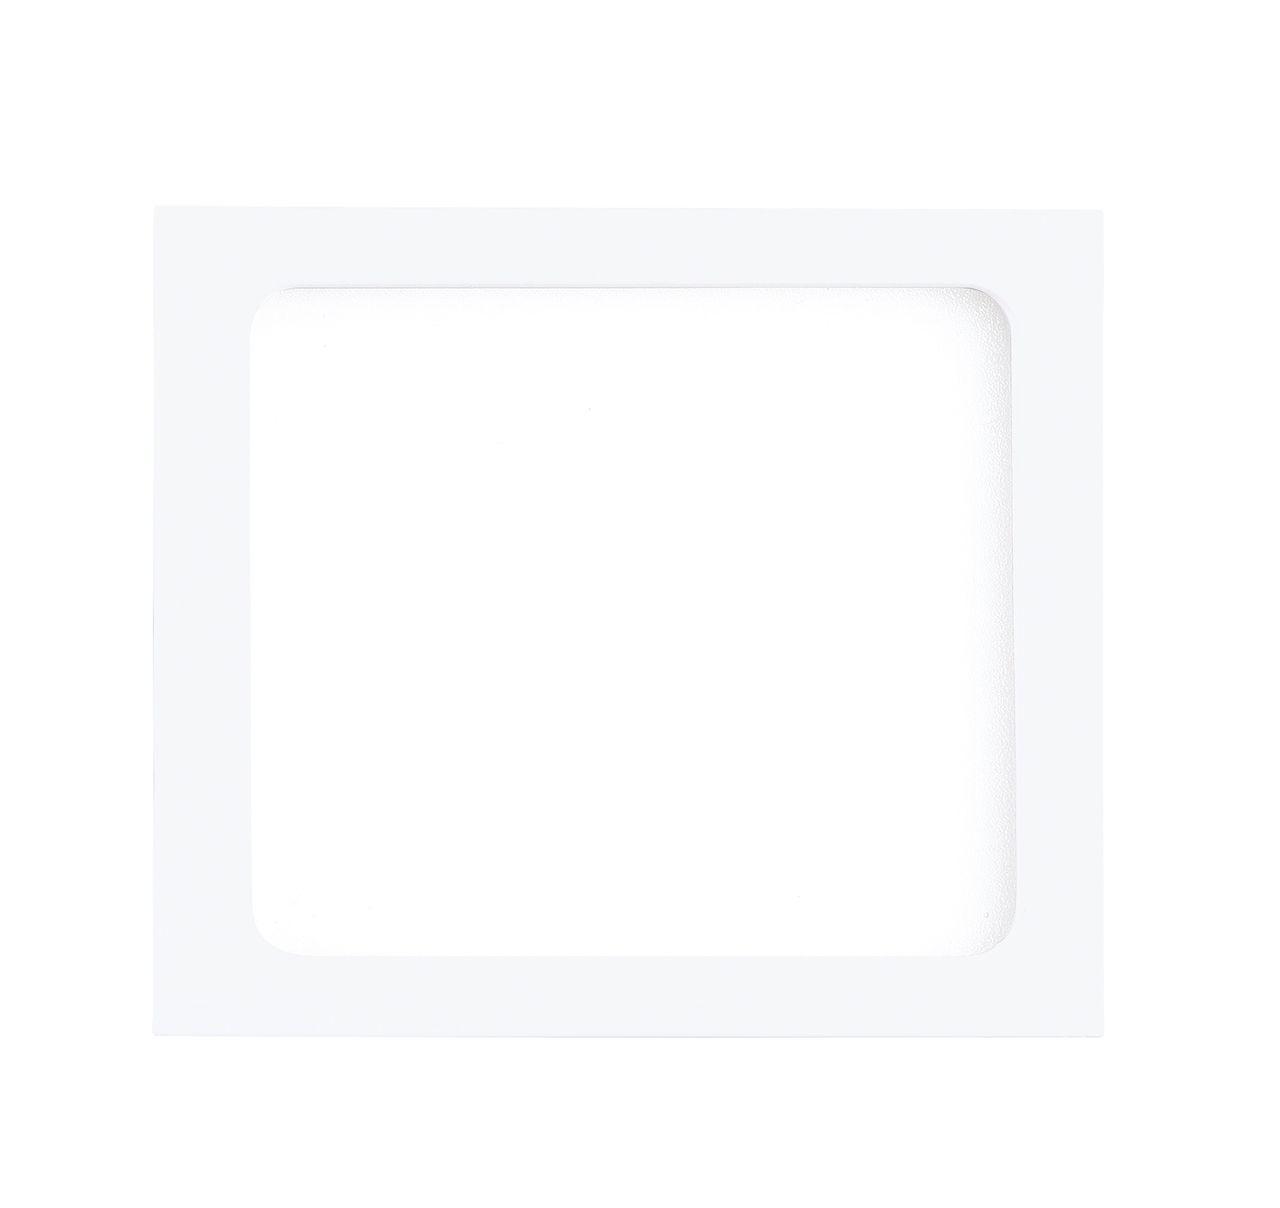 цена на Встраиваемый светильник Eglo, LED, 18 Вт